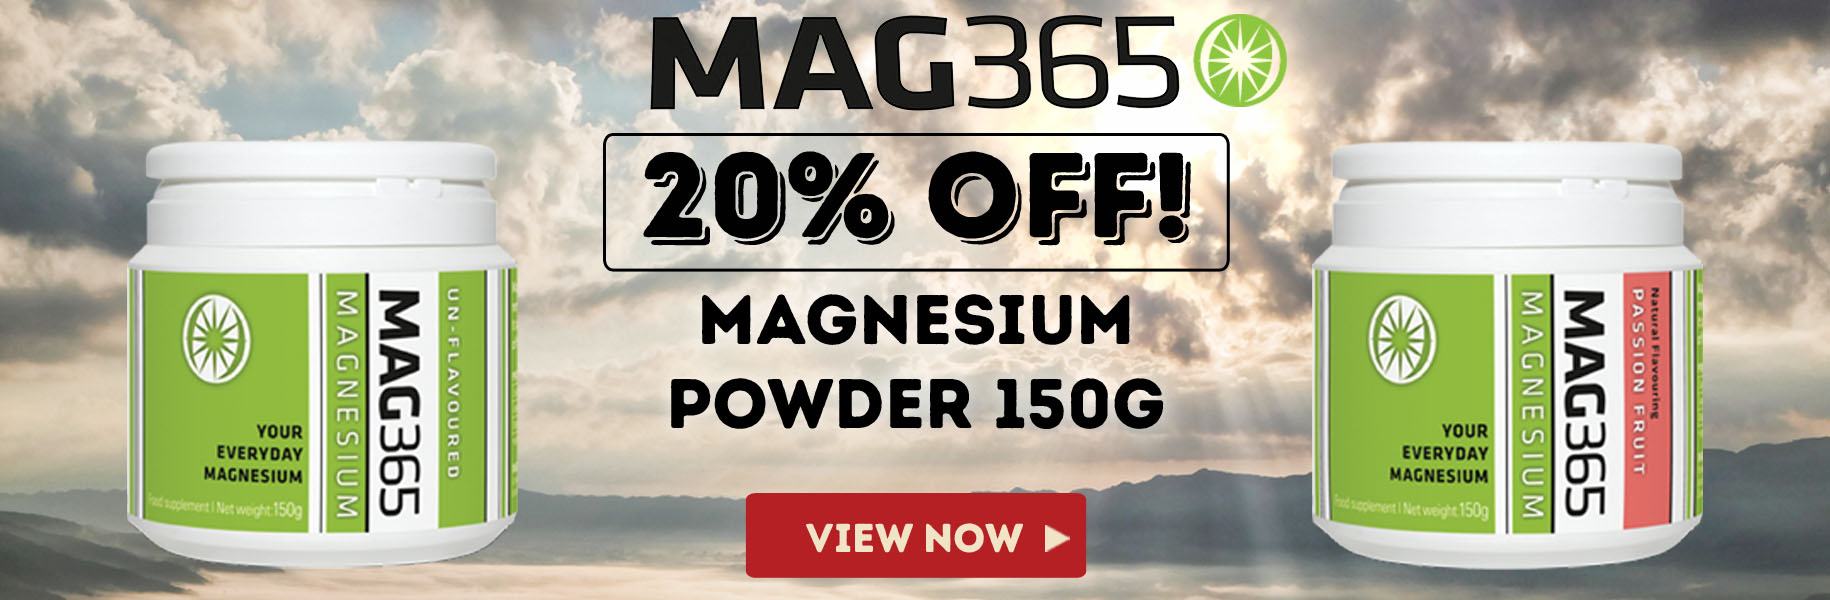 MAG365